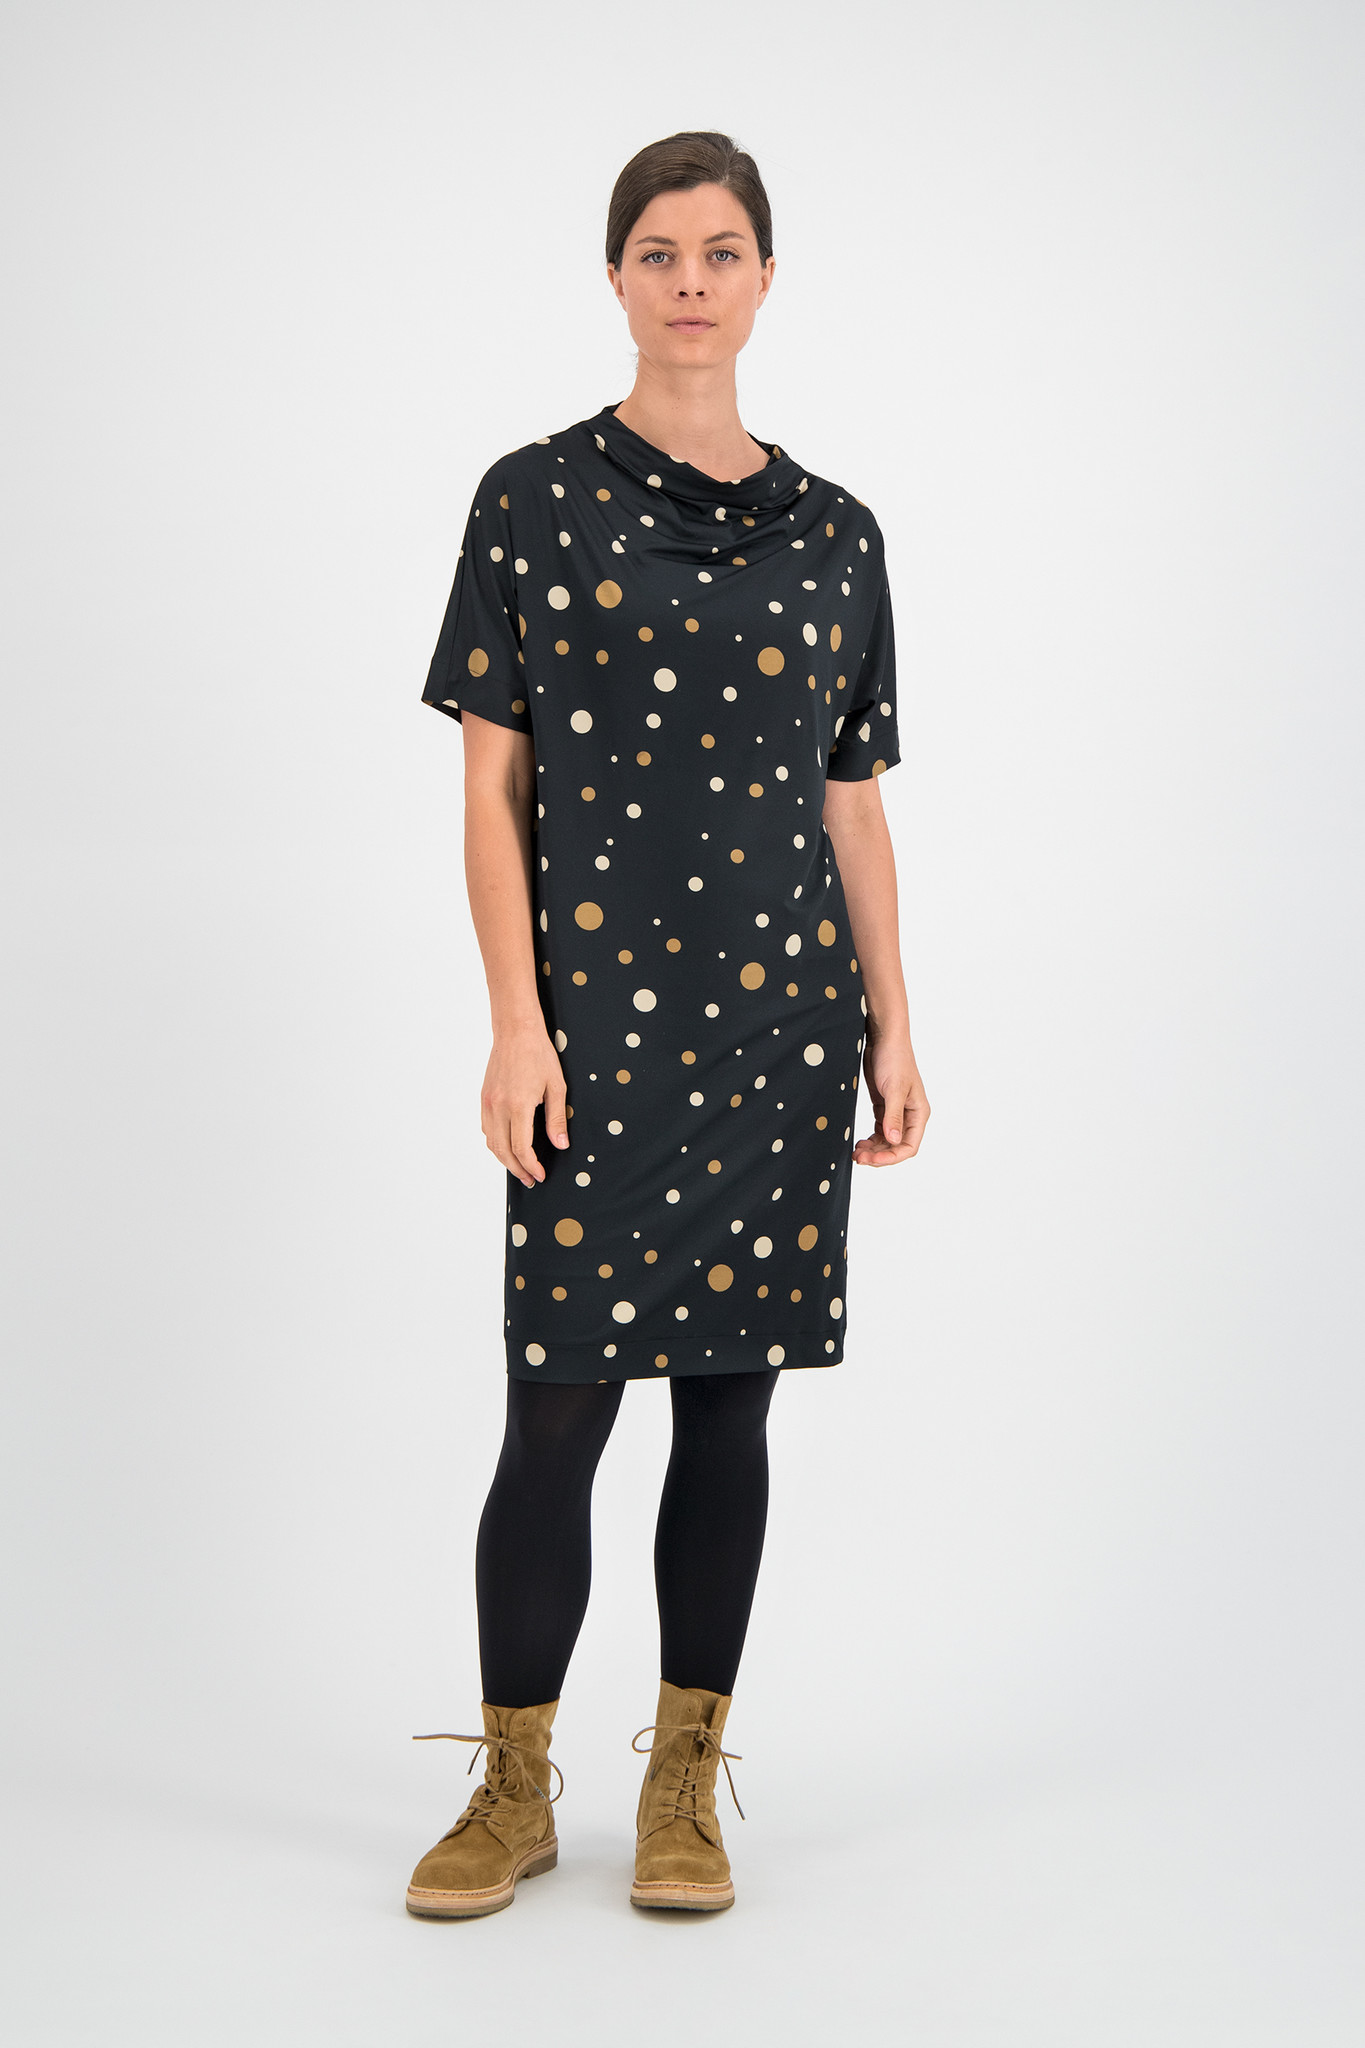 SYLVER Fantasy Dot Dress Turtle-neck - Black